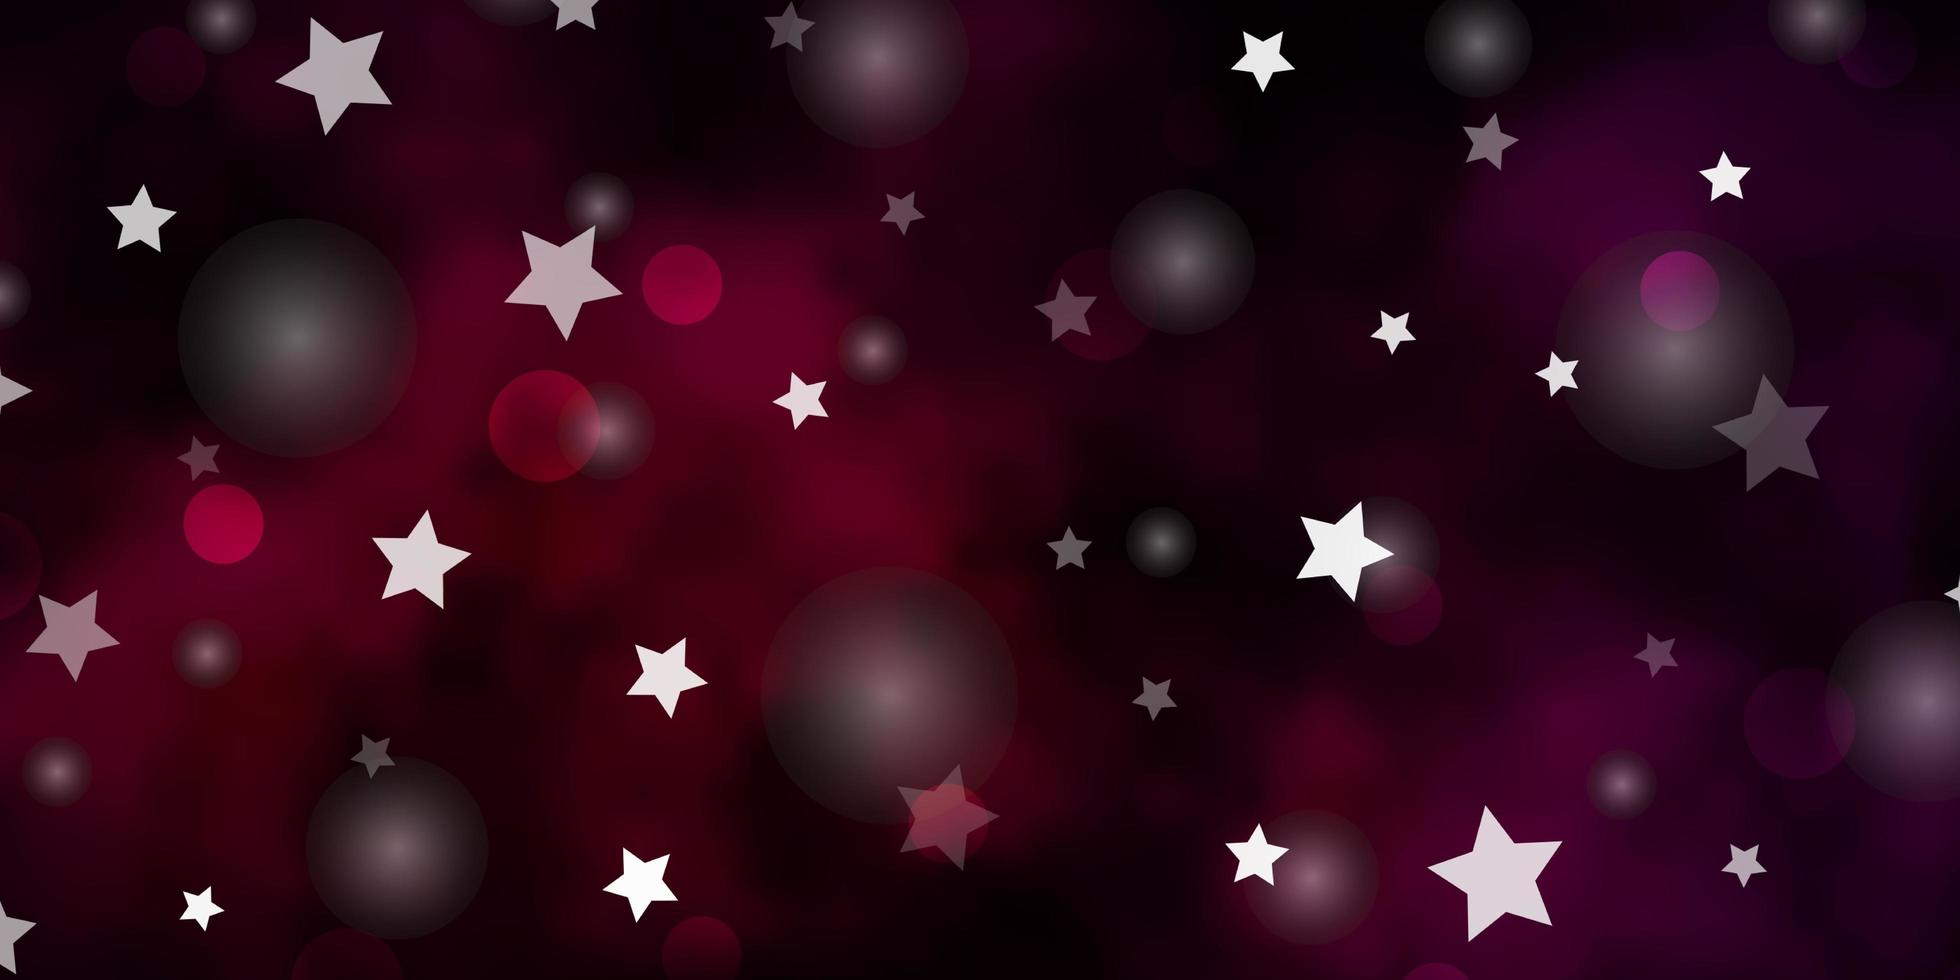 dunkelviolettes Vektorlayout mit Kreisen, Sternen. vektor